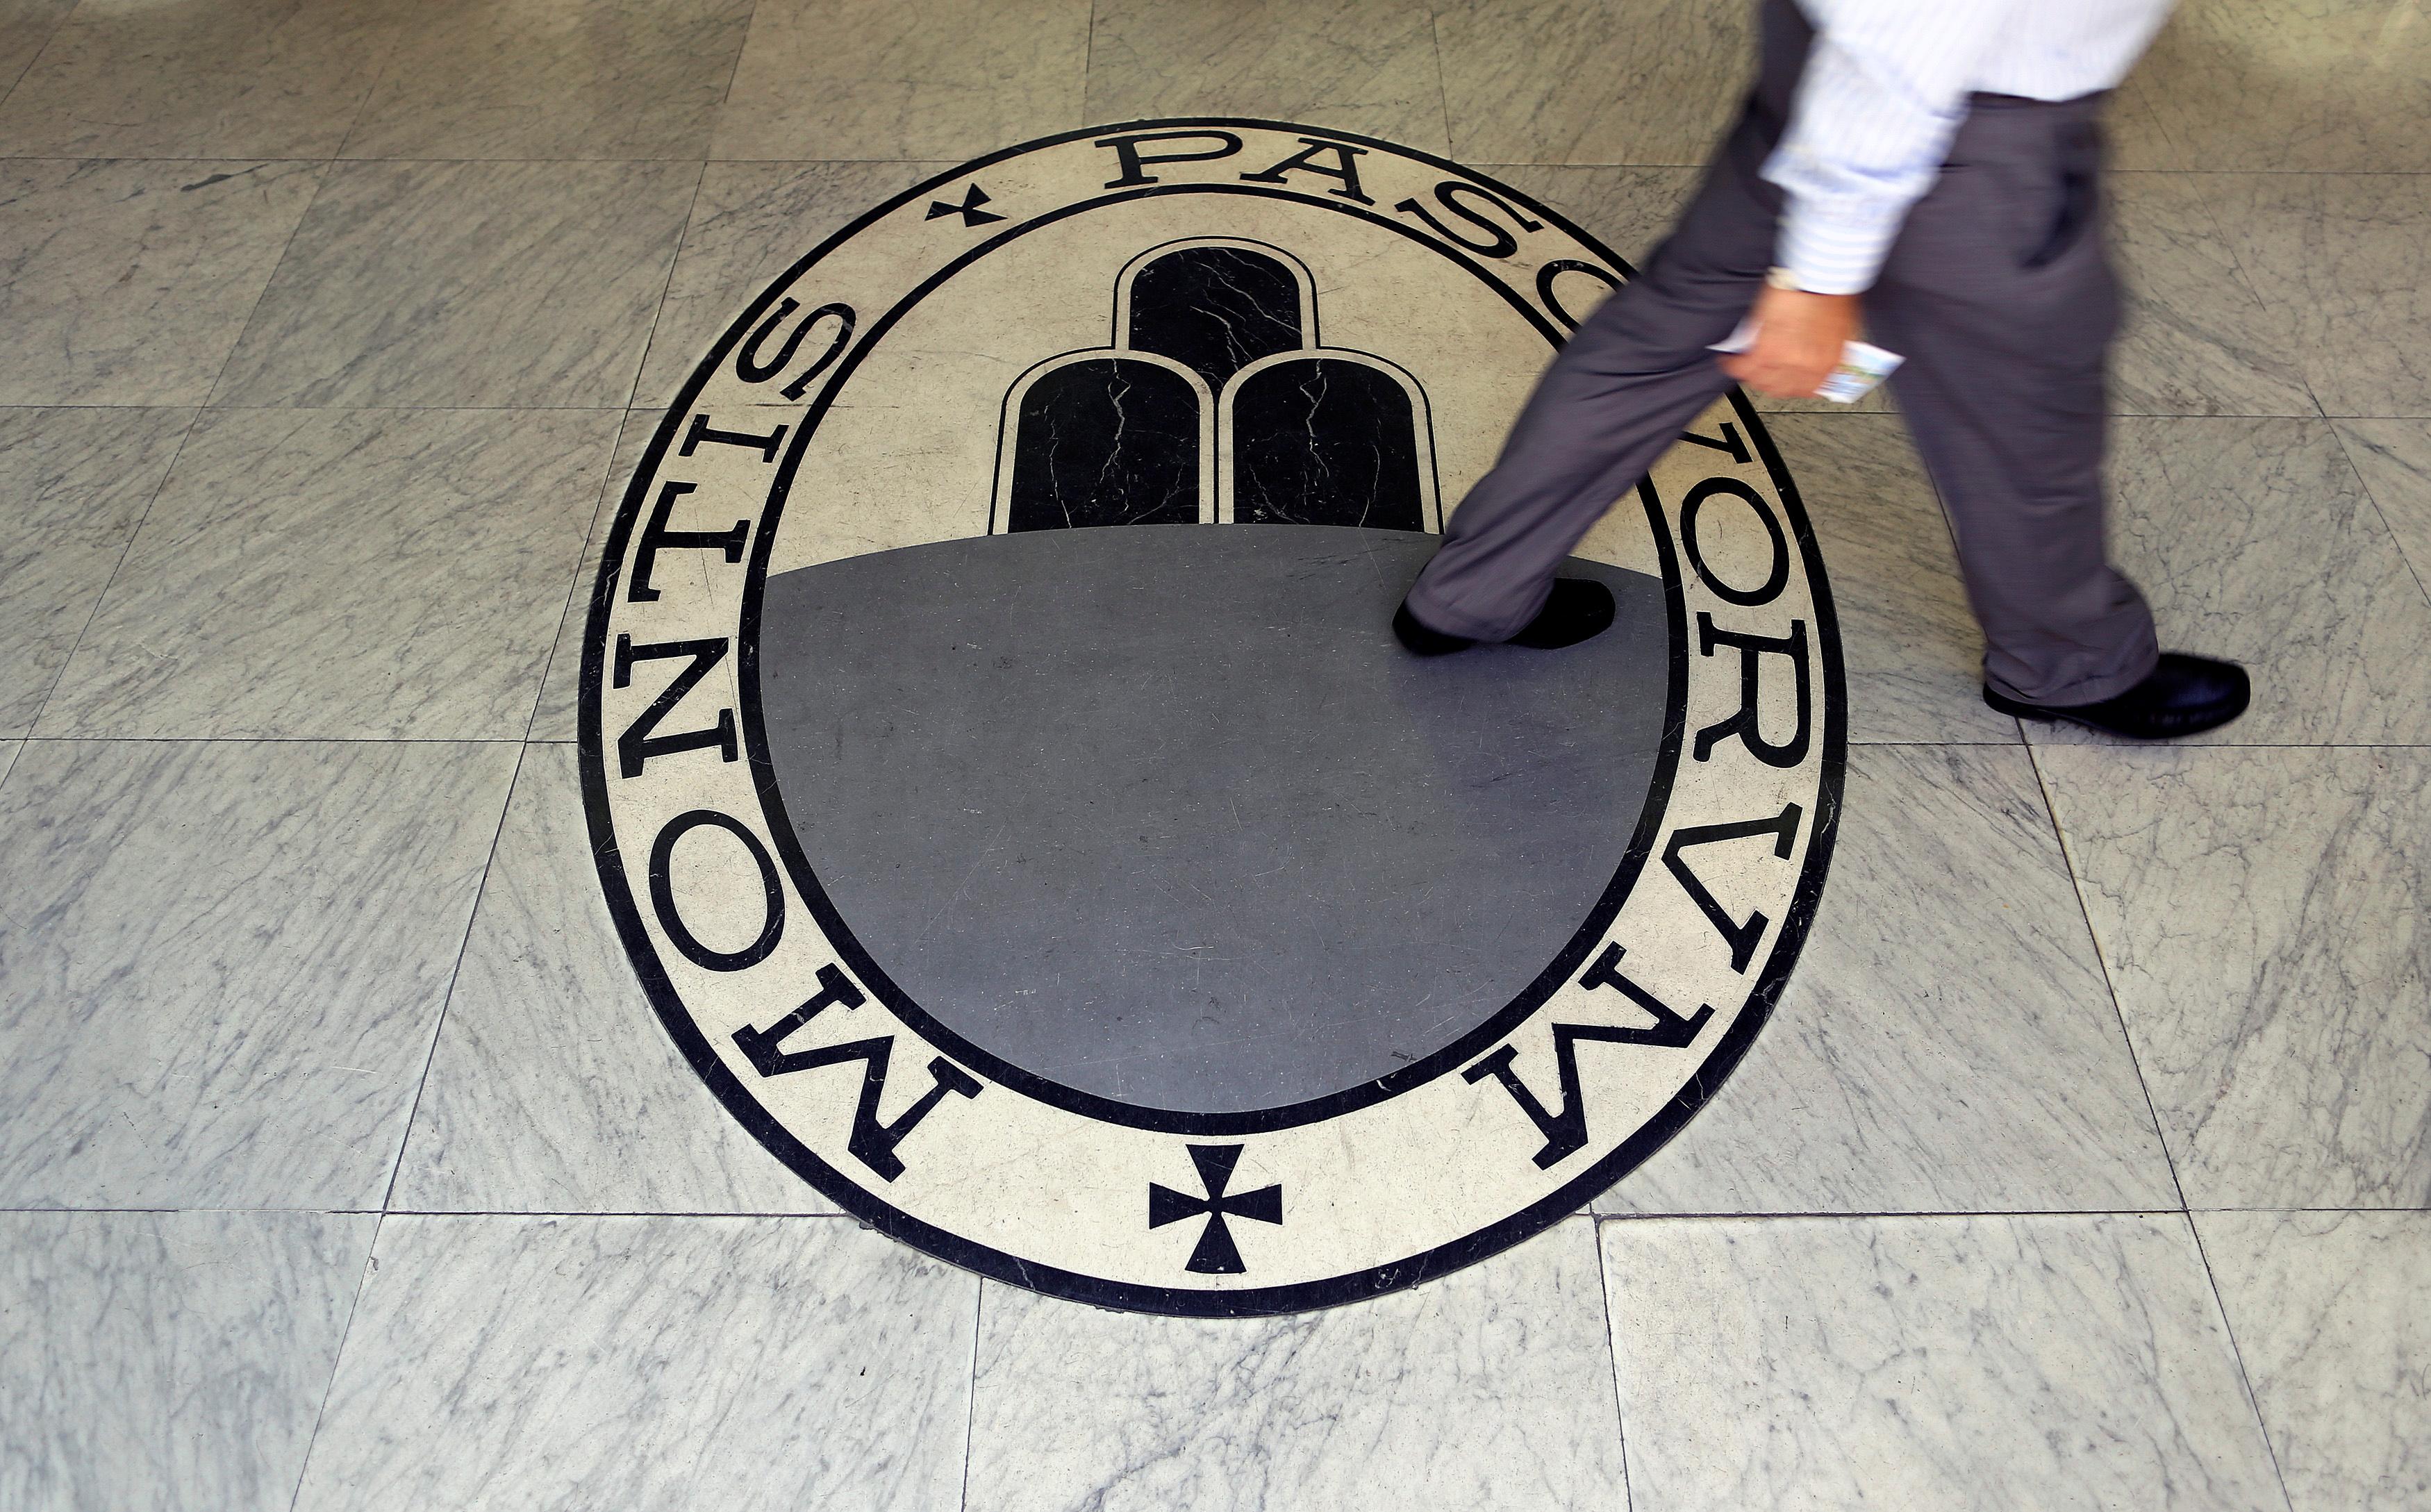 Italian bank Monte dei Paschi di Siena needs 8,8 billion